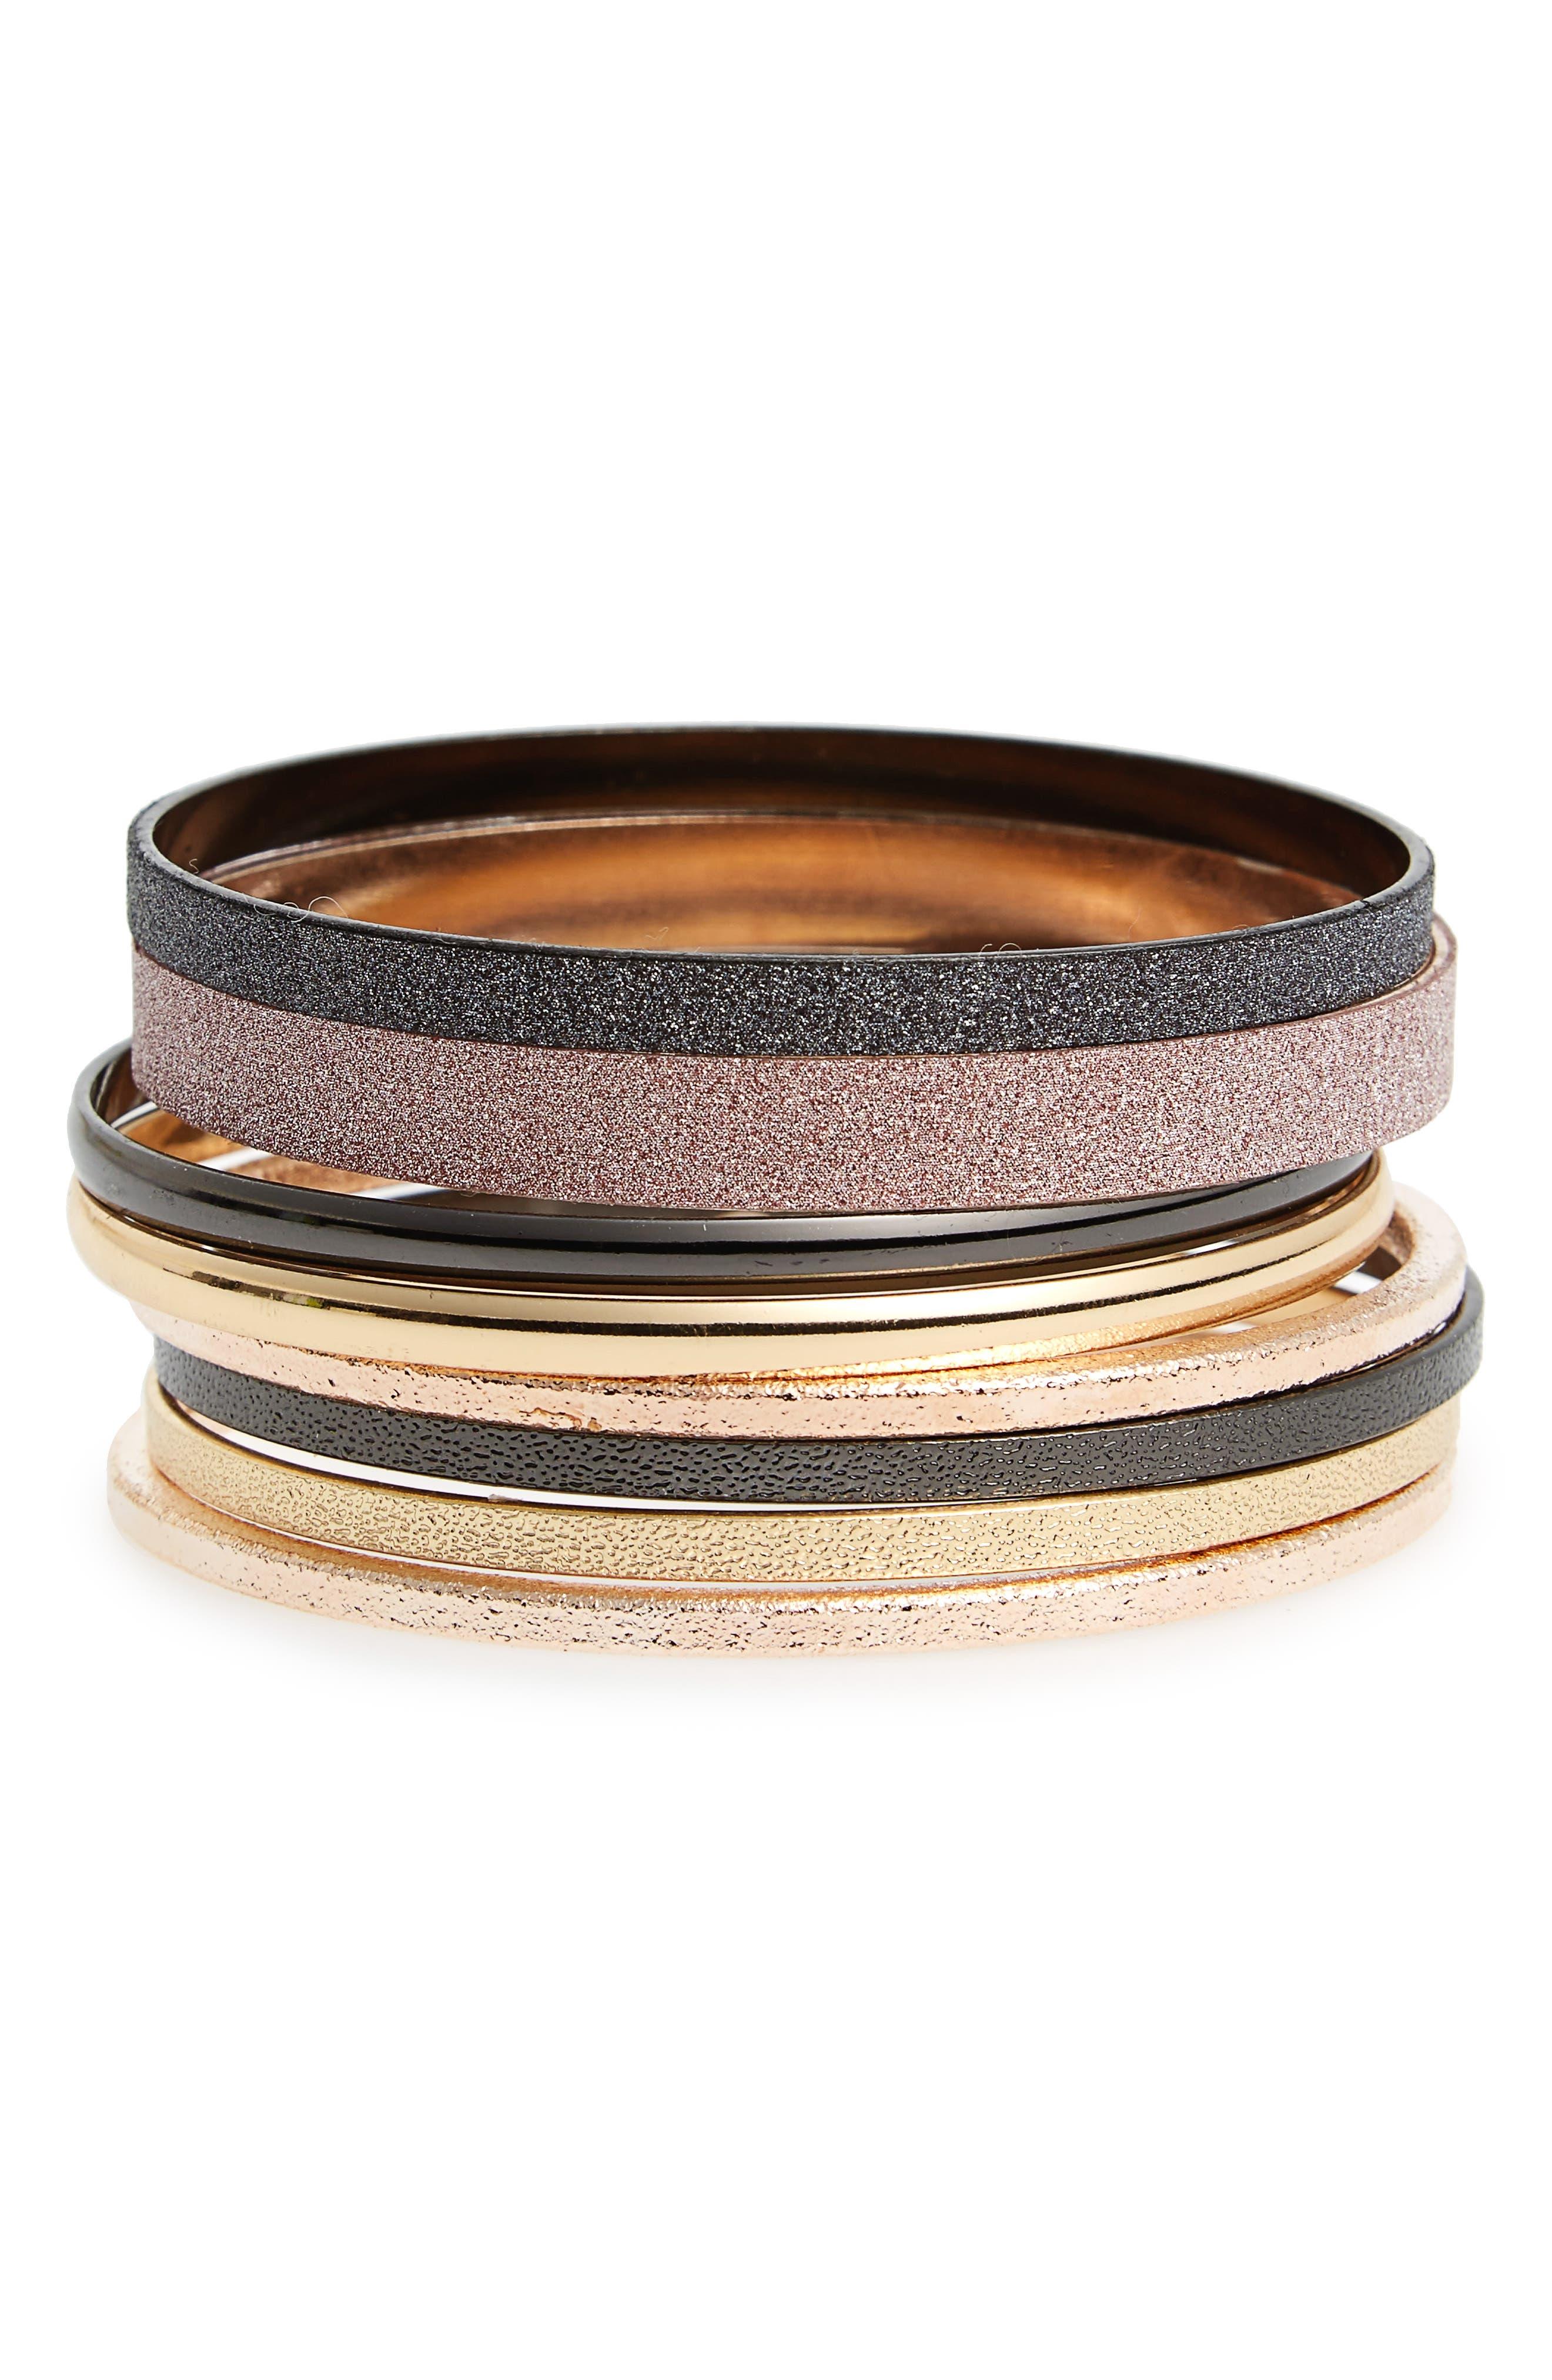 Topshop Set of 8 Glitter Bangle Bracelets